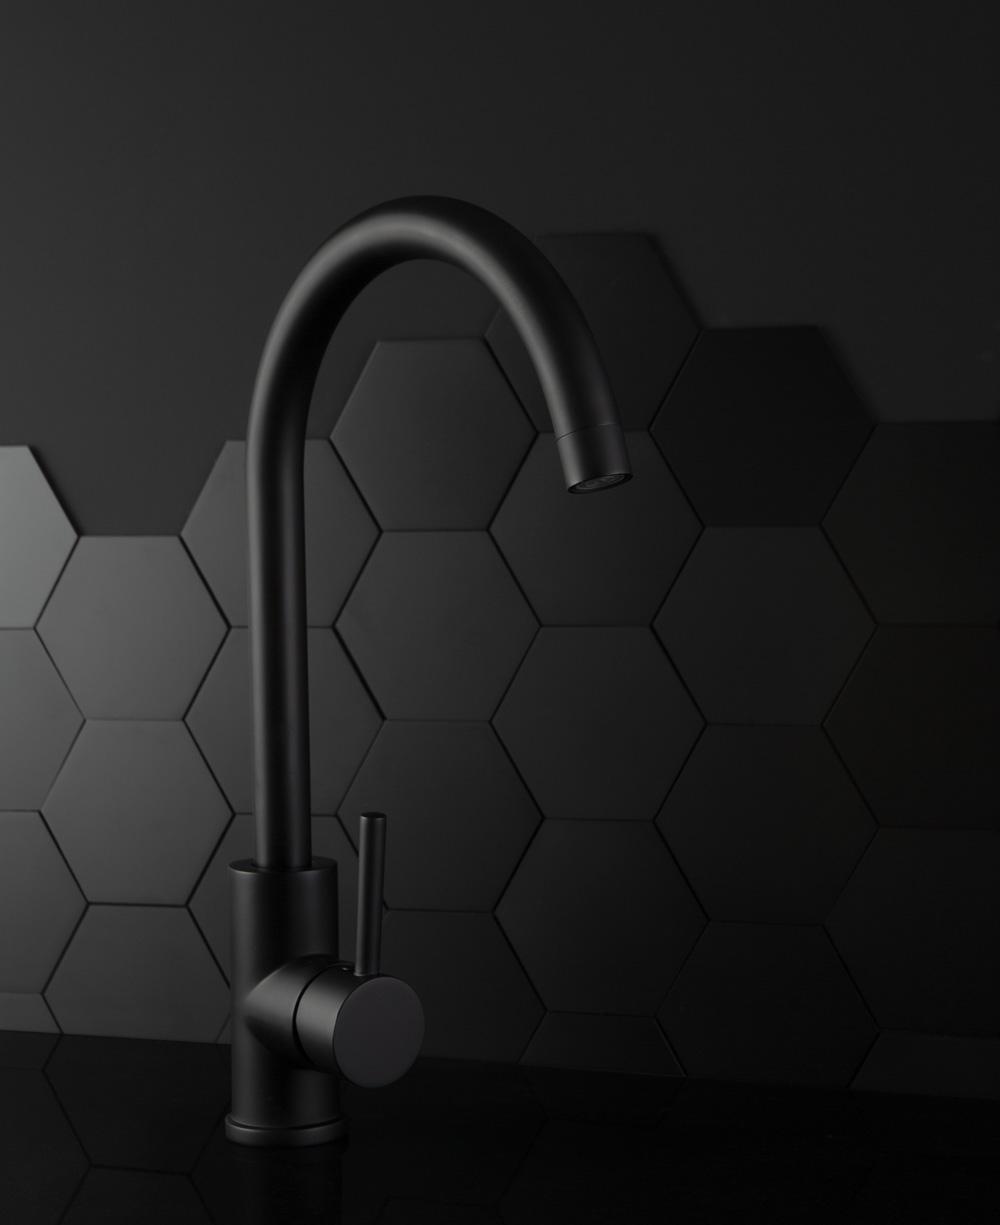 Interior design trends for autumn winter 2019 - black kitchens